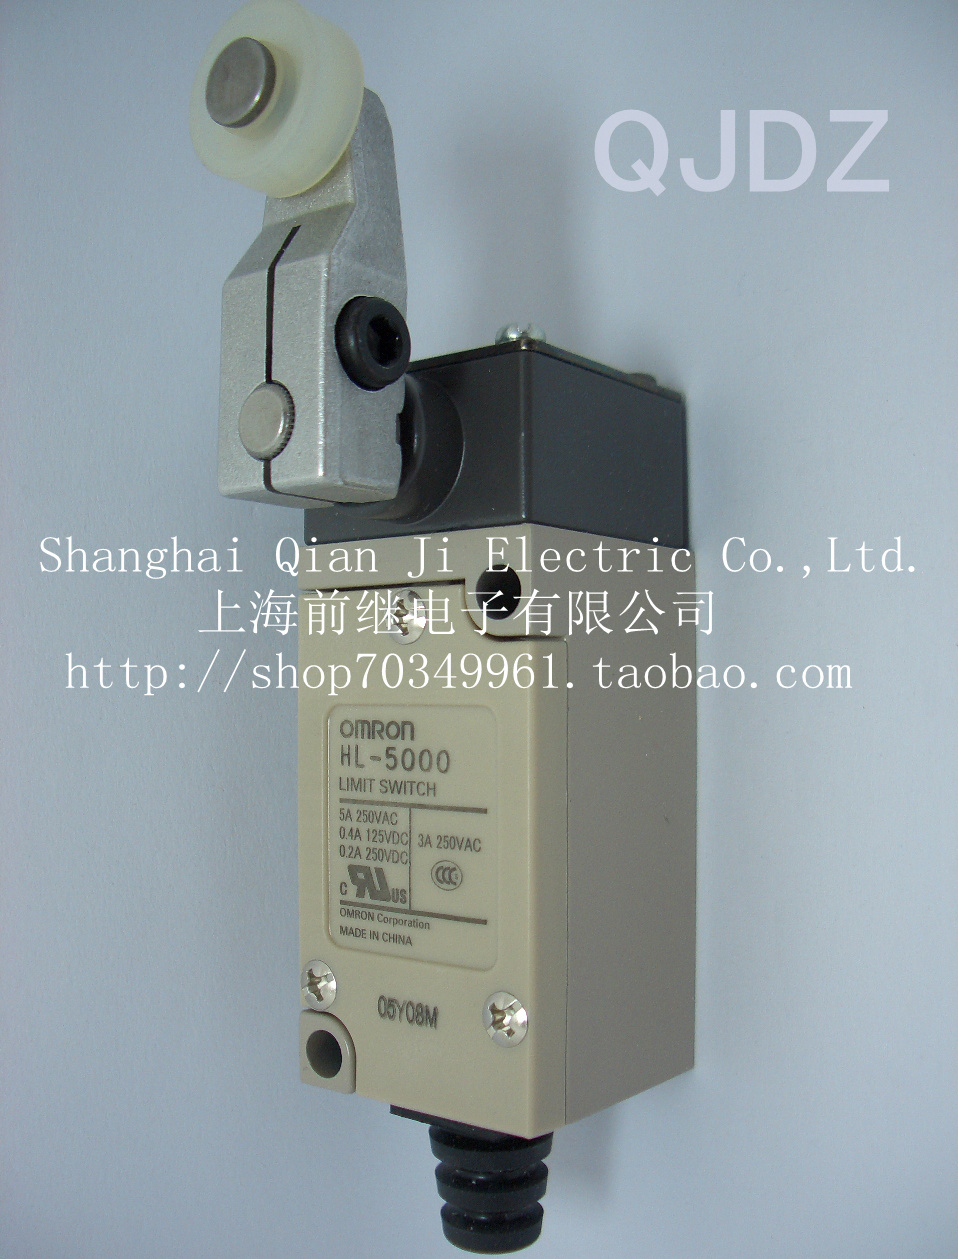 HL-5000 HL-5000 industrial control limit switch wlca2 2n wlca2 2n industrial control limit switch